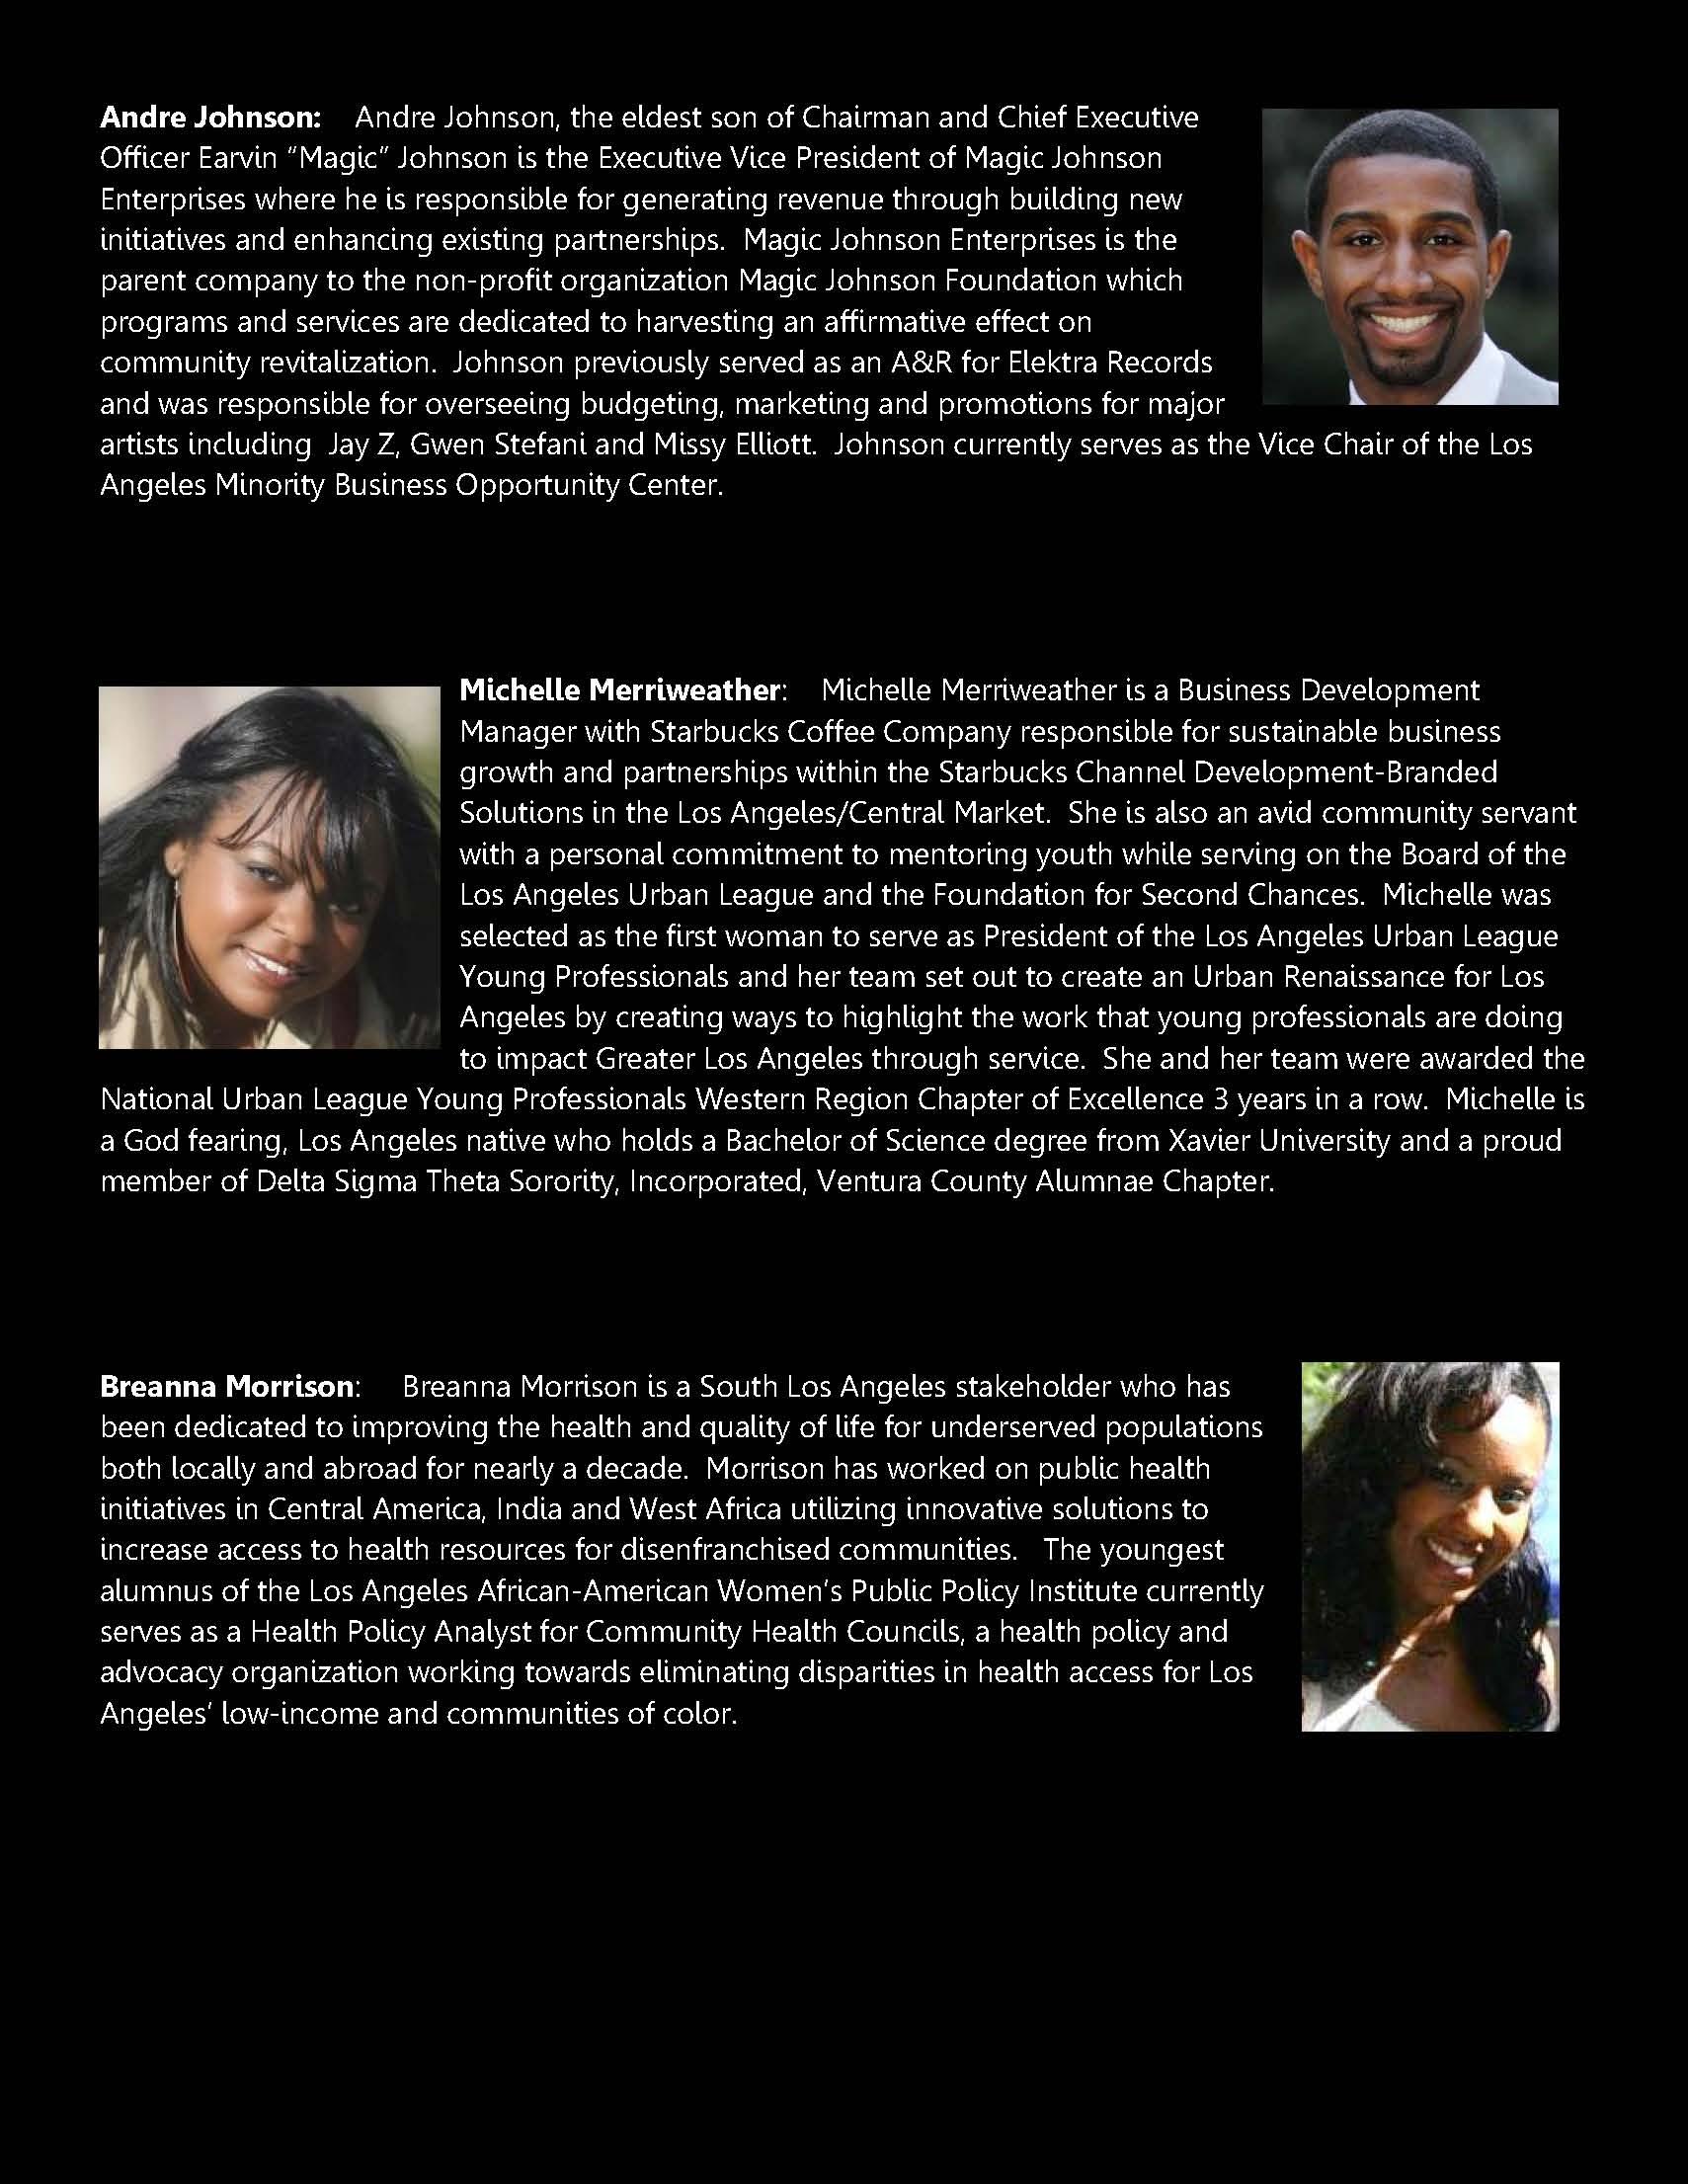 Bio Page 2